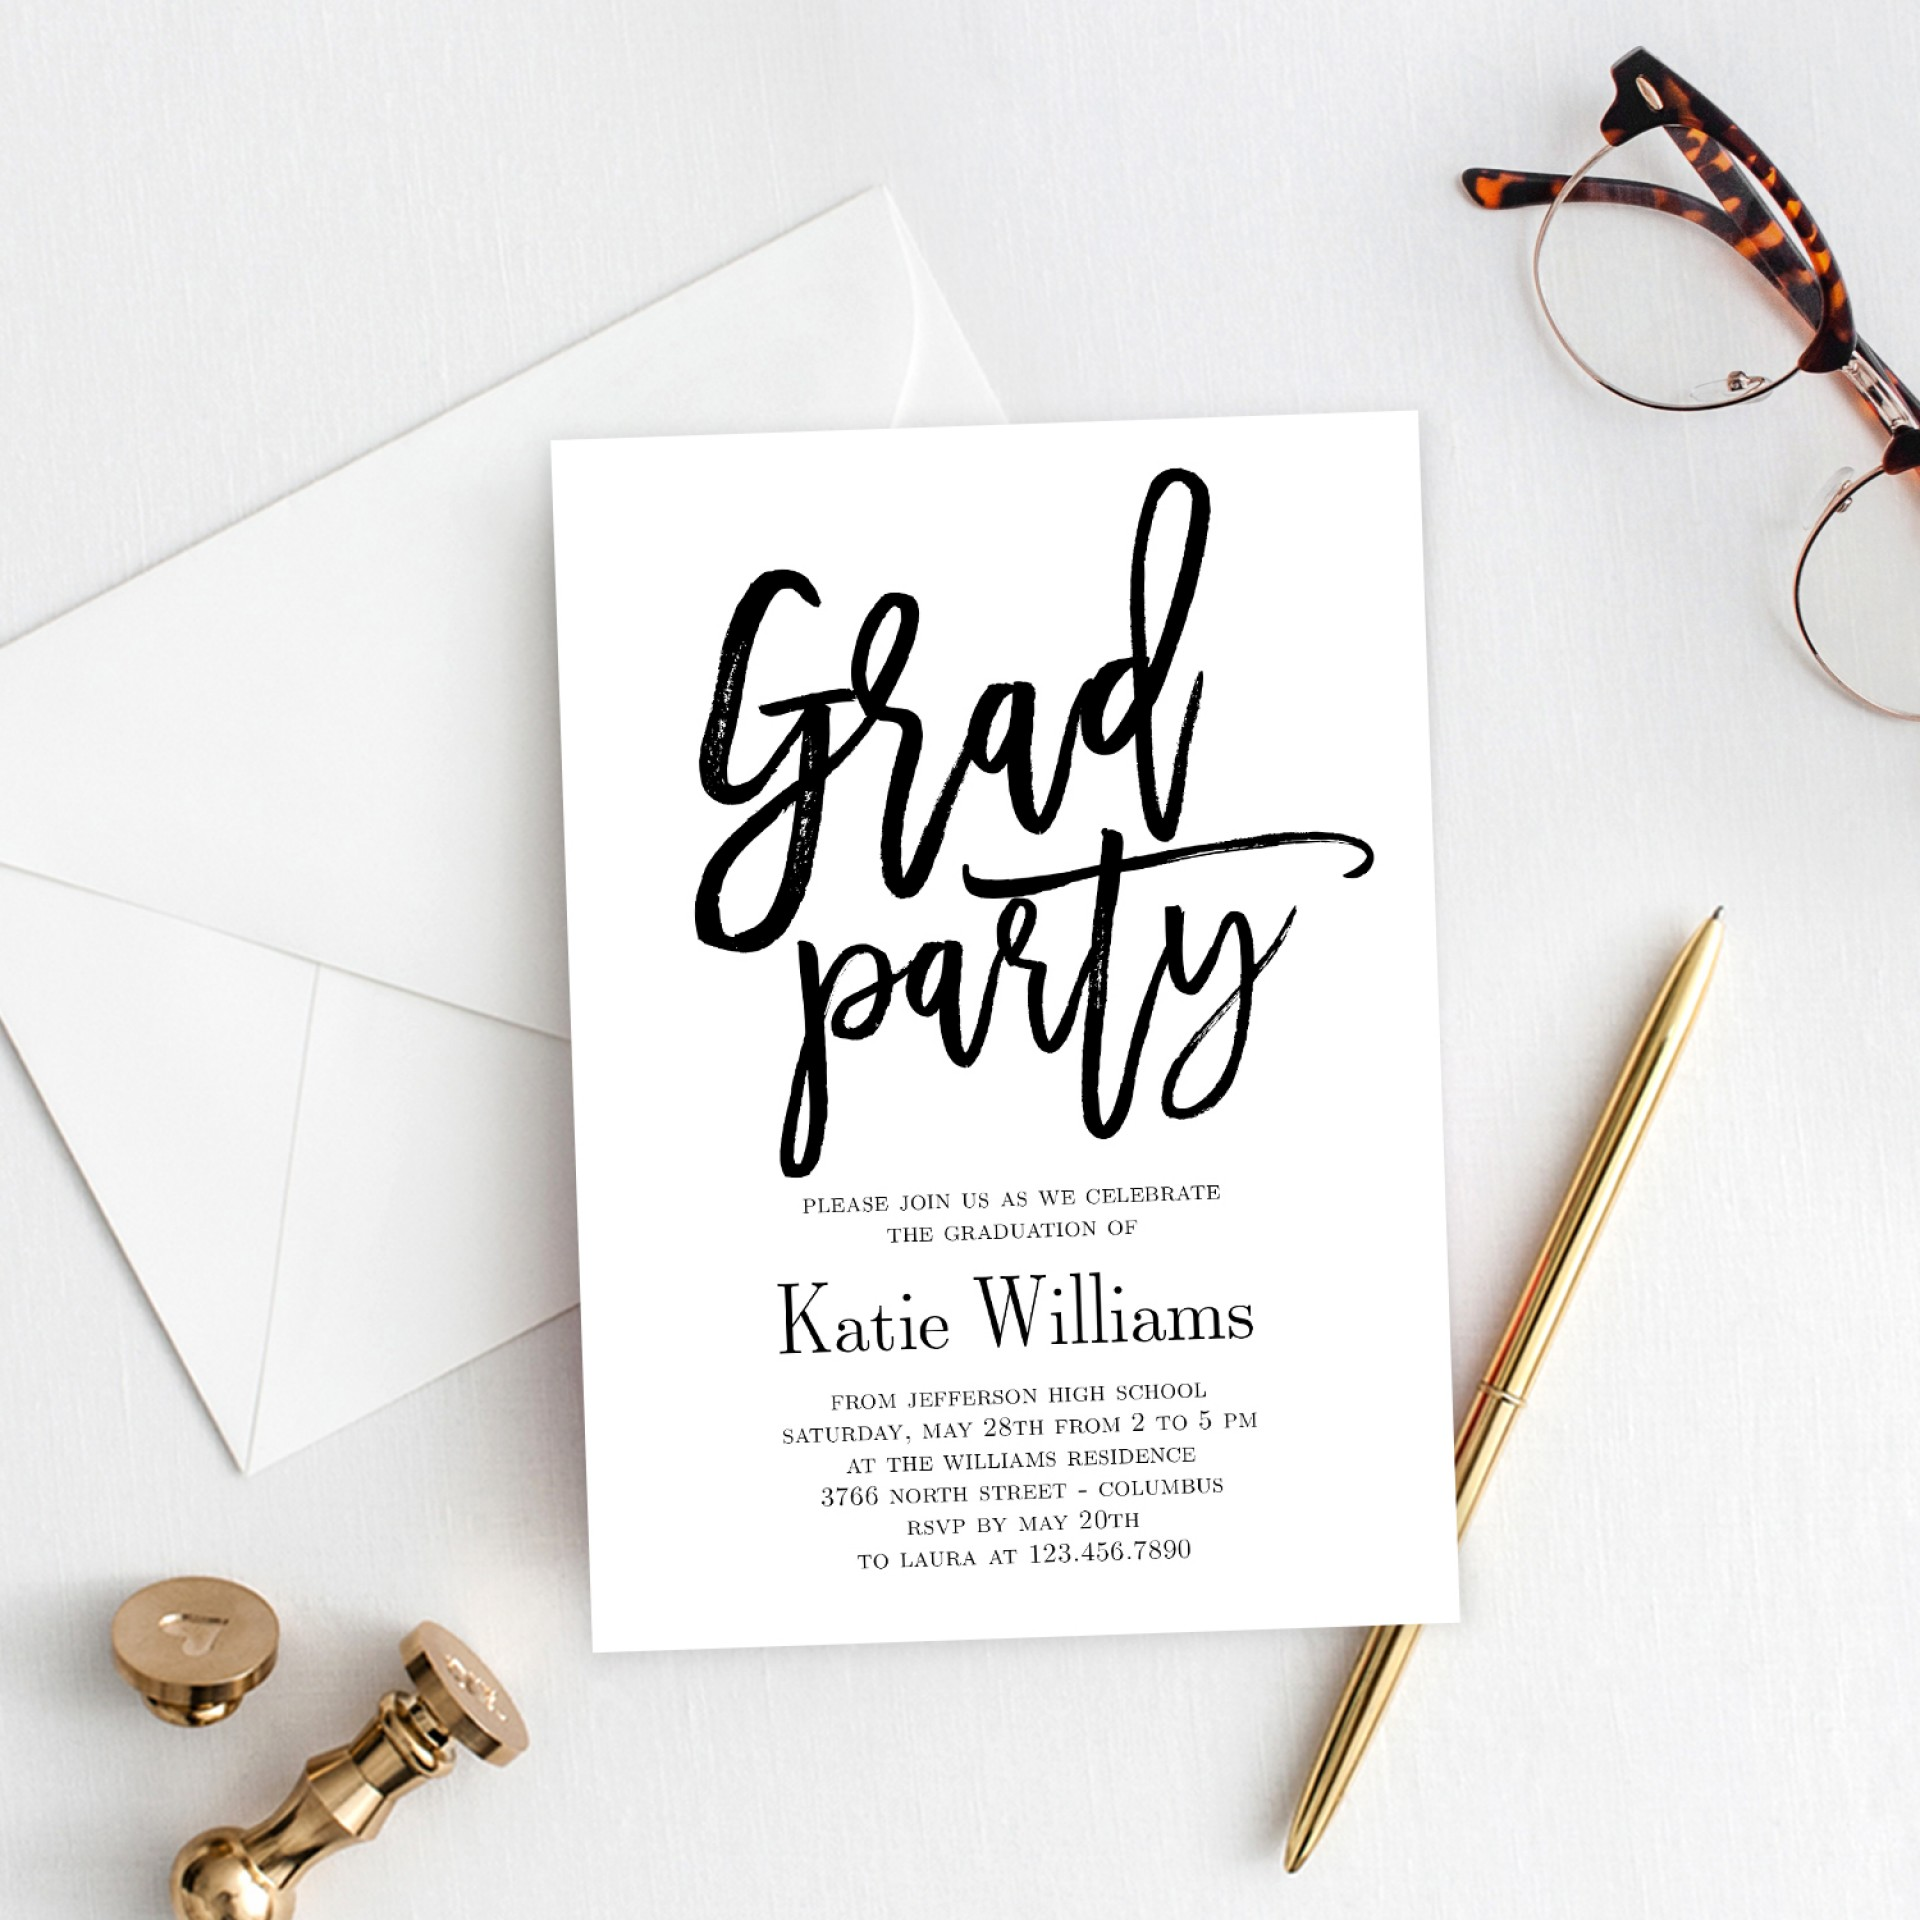 003 Striking Graduation Party Invitation Template Inspiration  Microsoft Word 4 Per Page1920